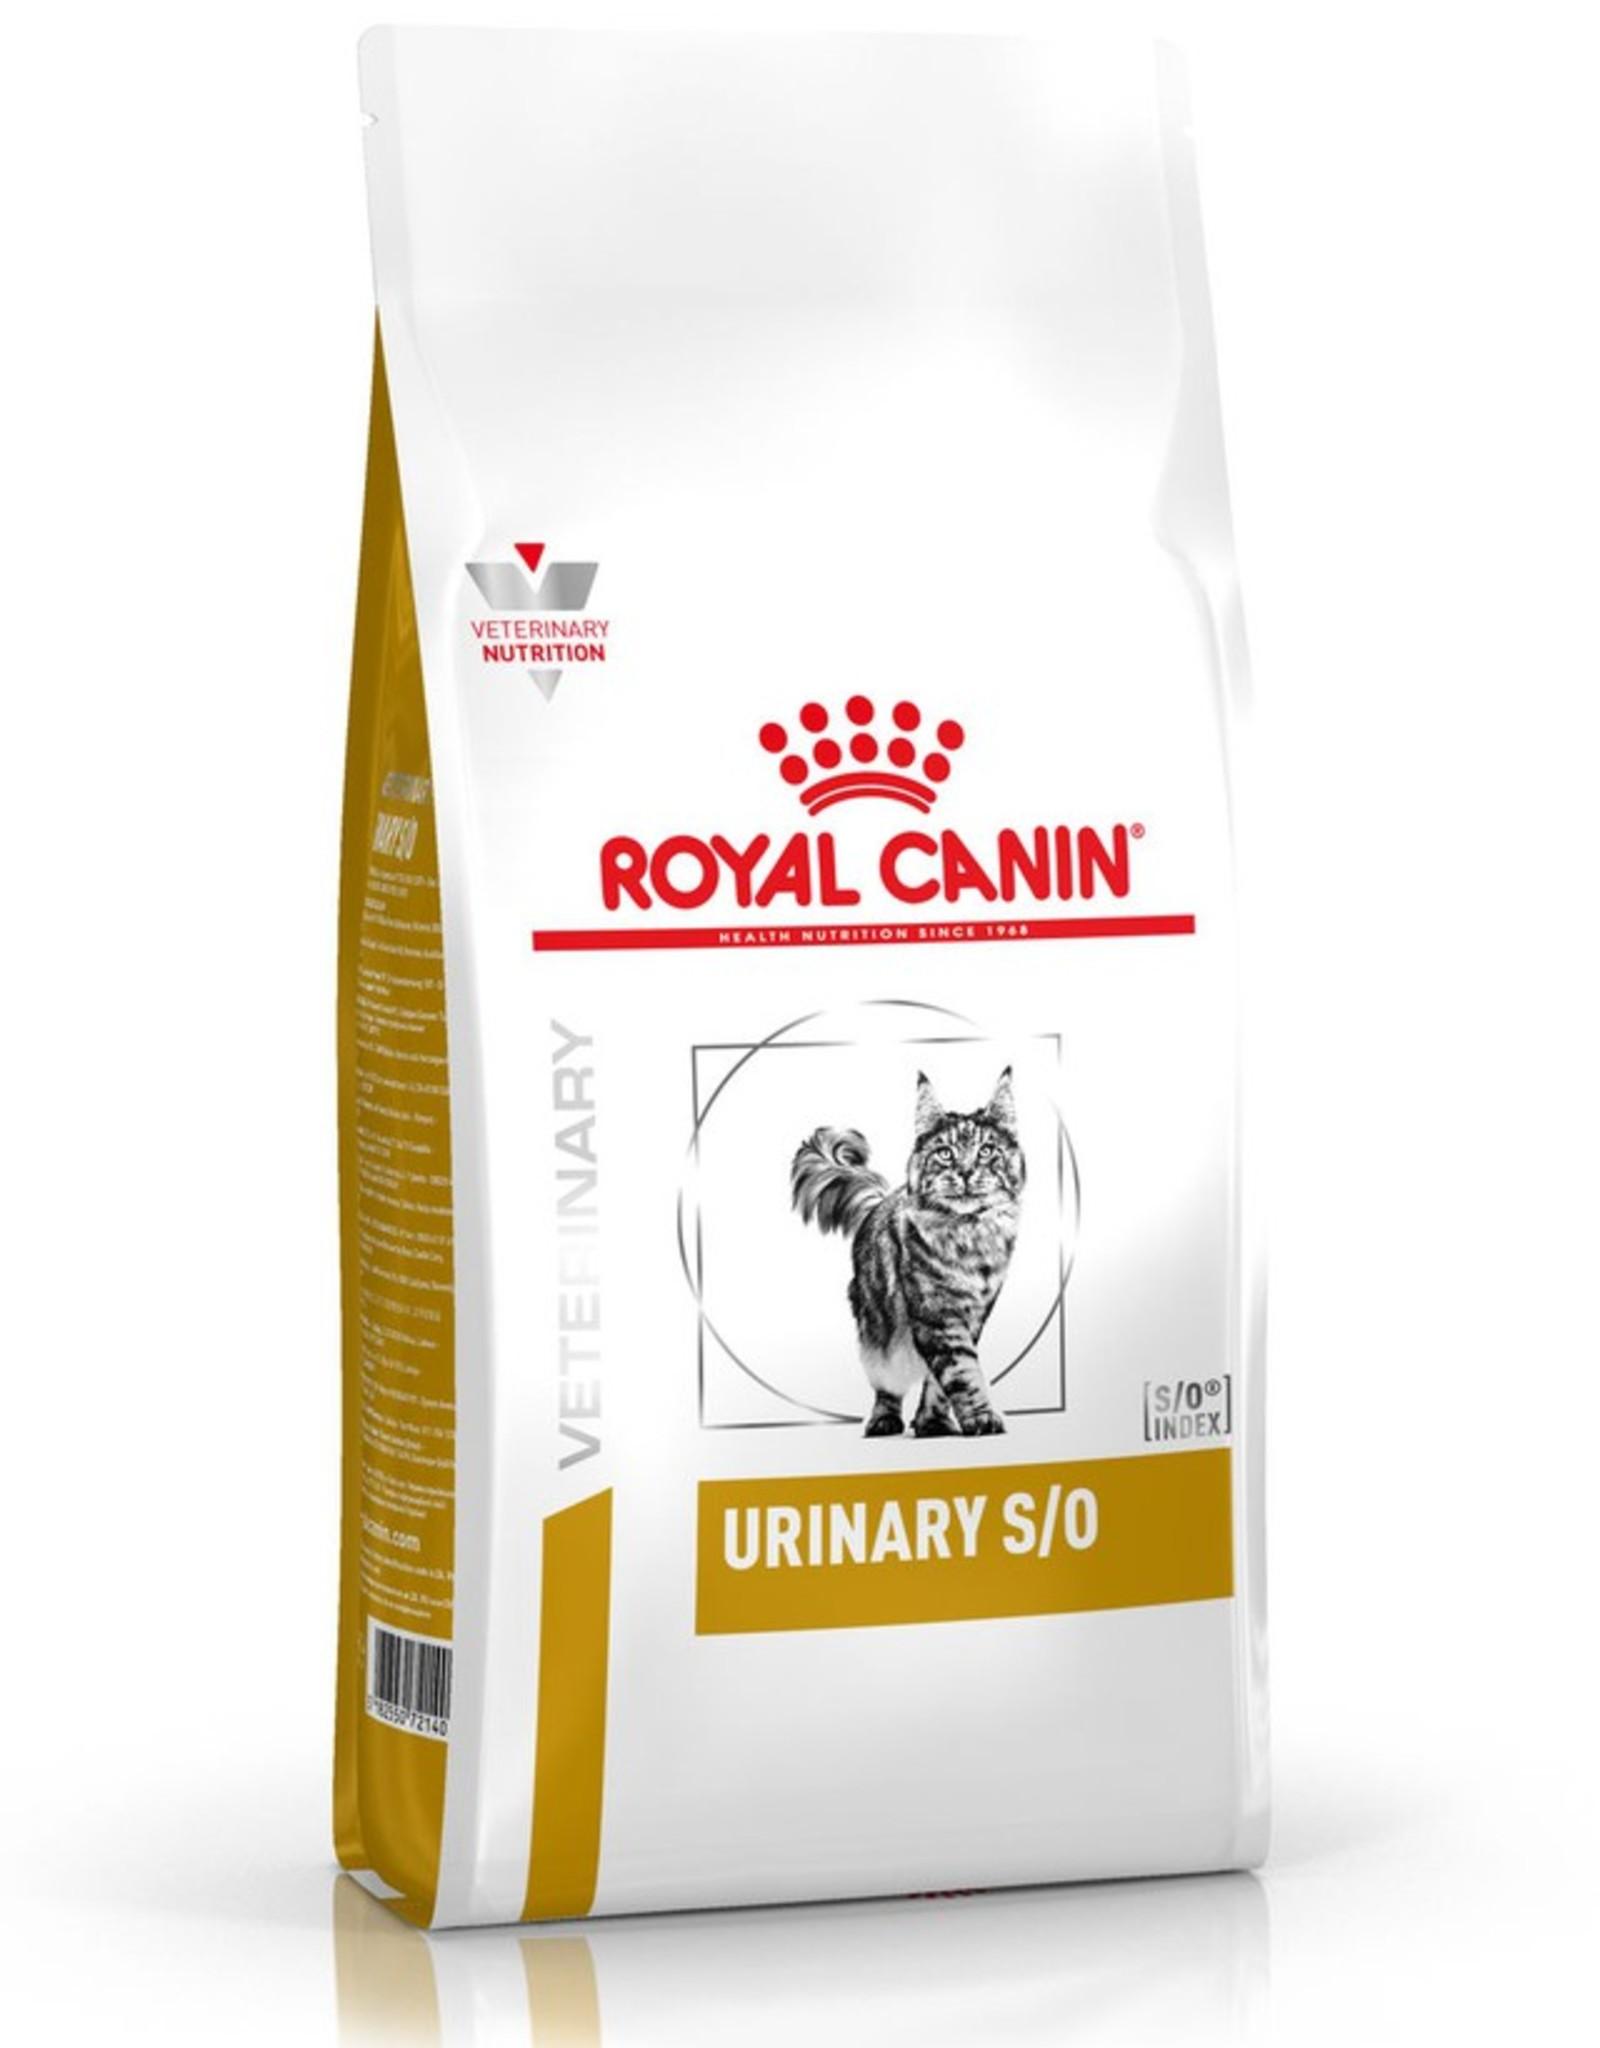 Royal Canin Royal Canin Urinary S/o Chat 1,5kg